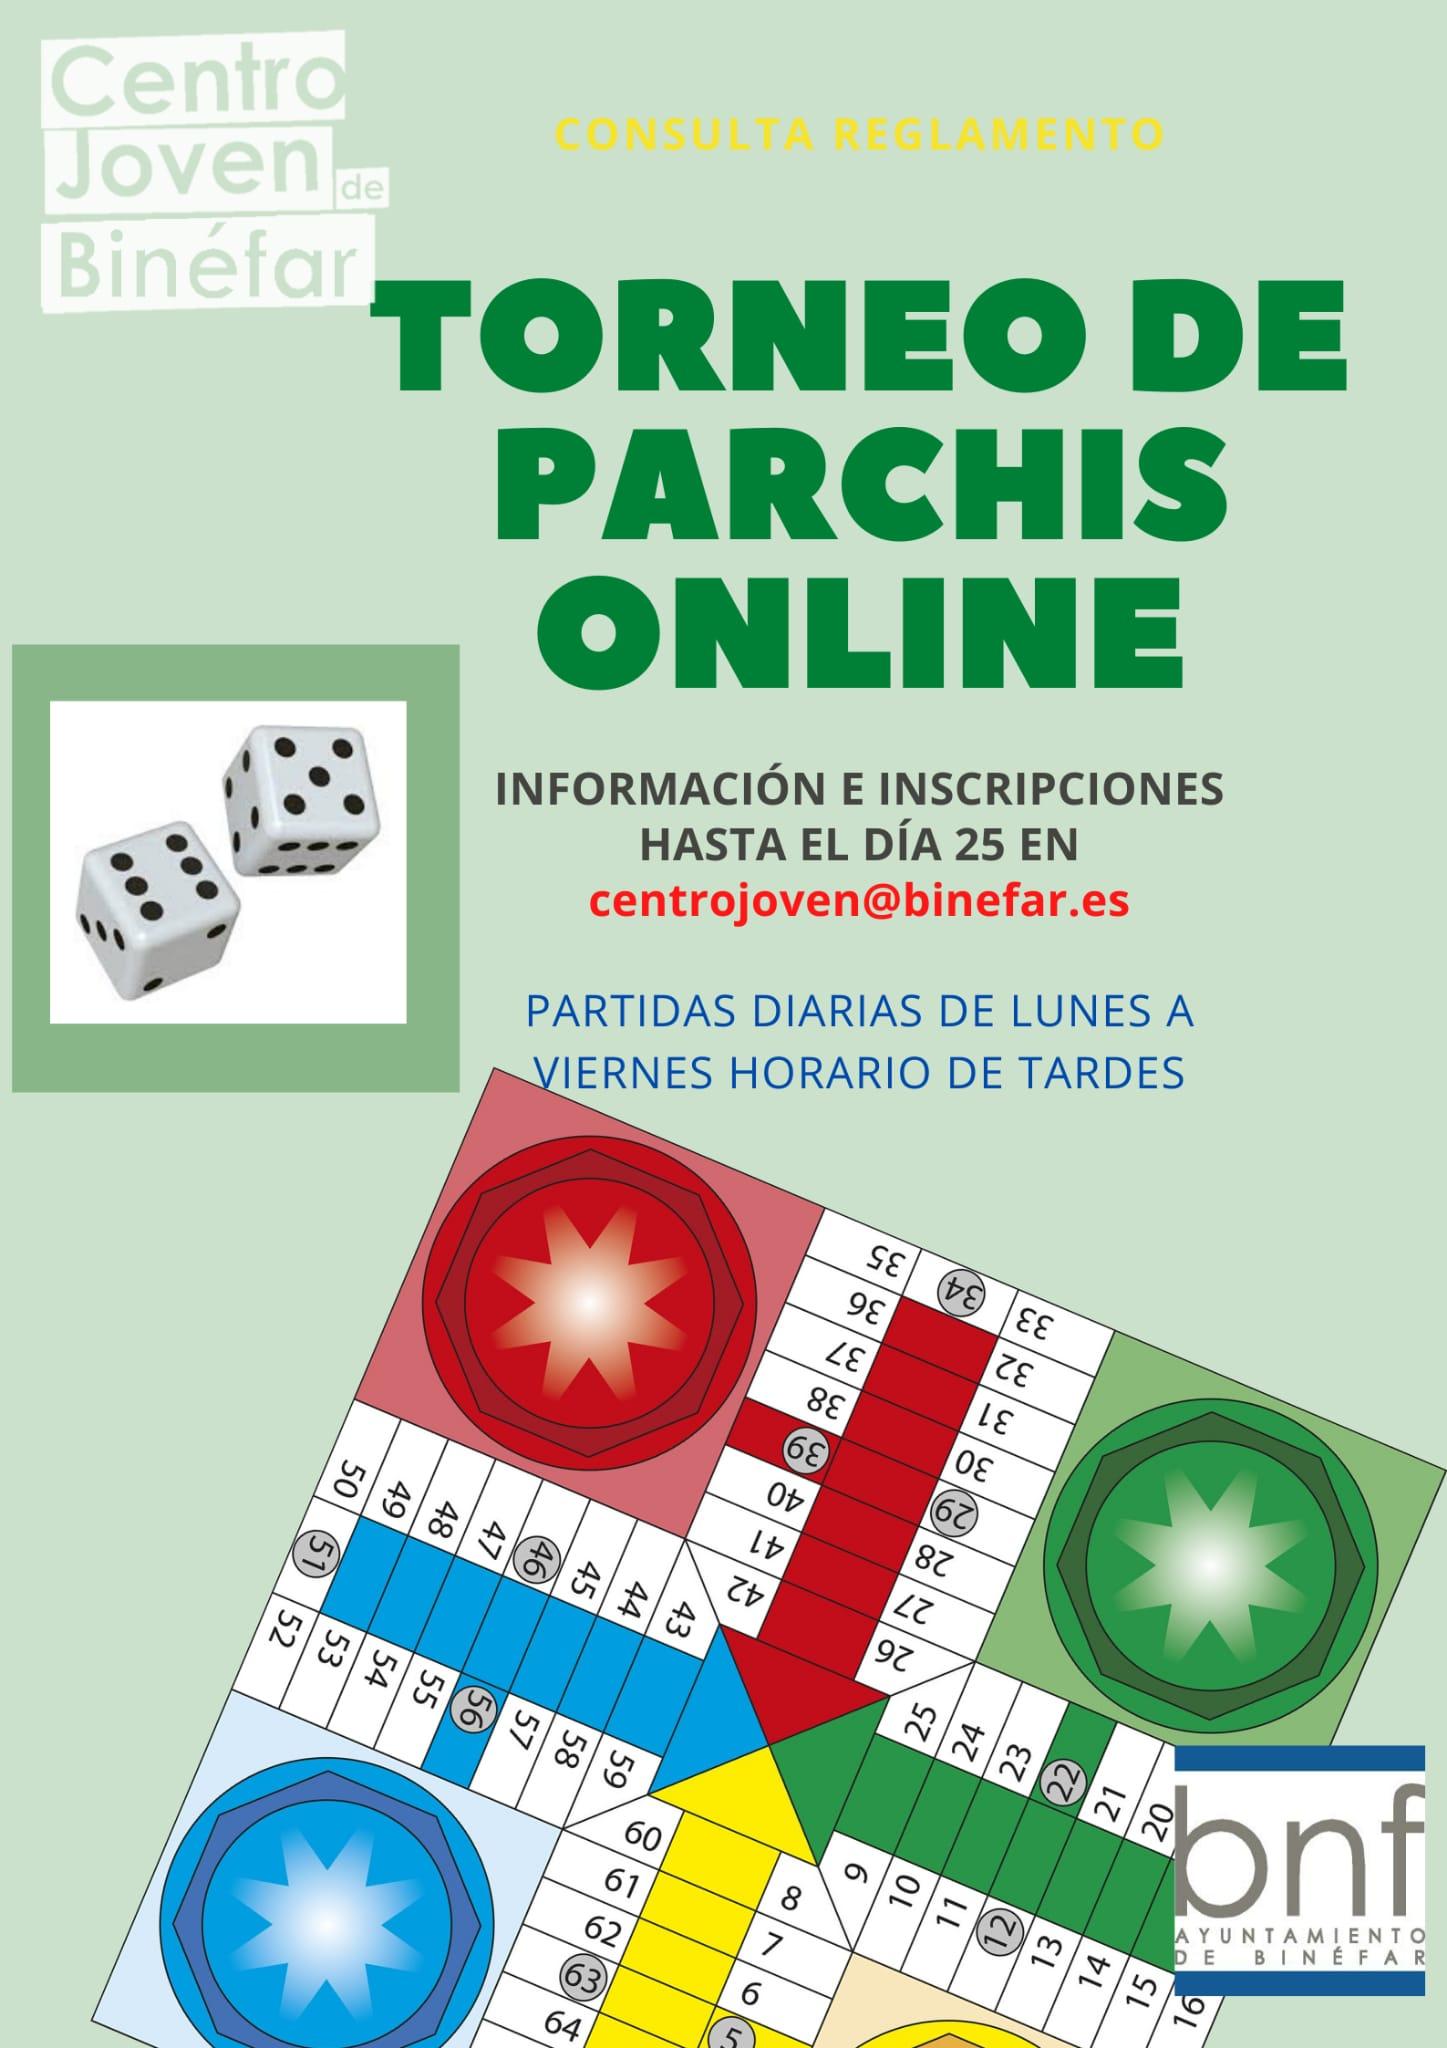 Torneo de pachís 'online'